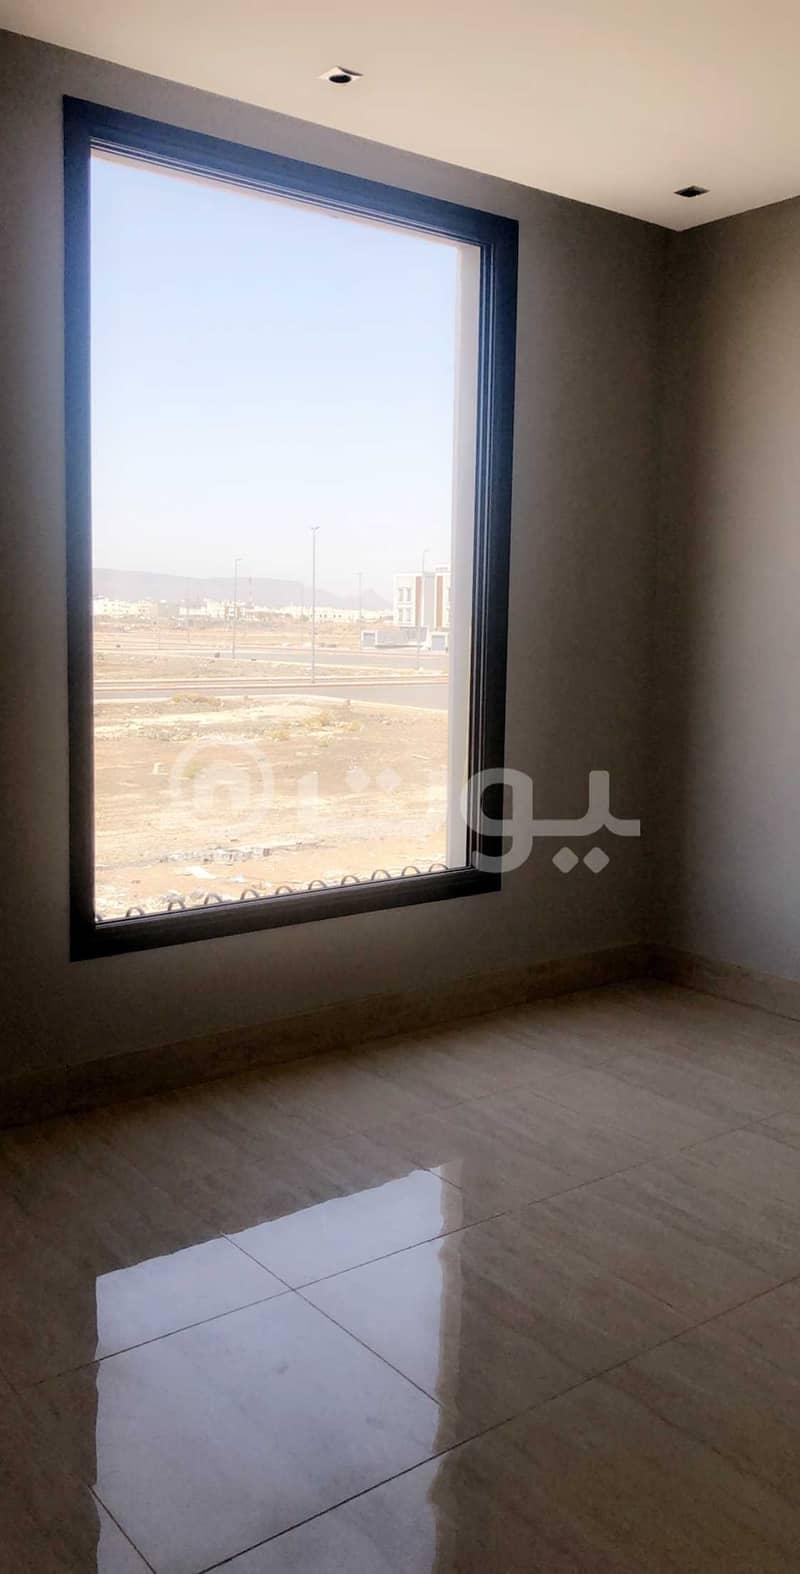 Luxury apartments for sale in Mudhainib, Madina